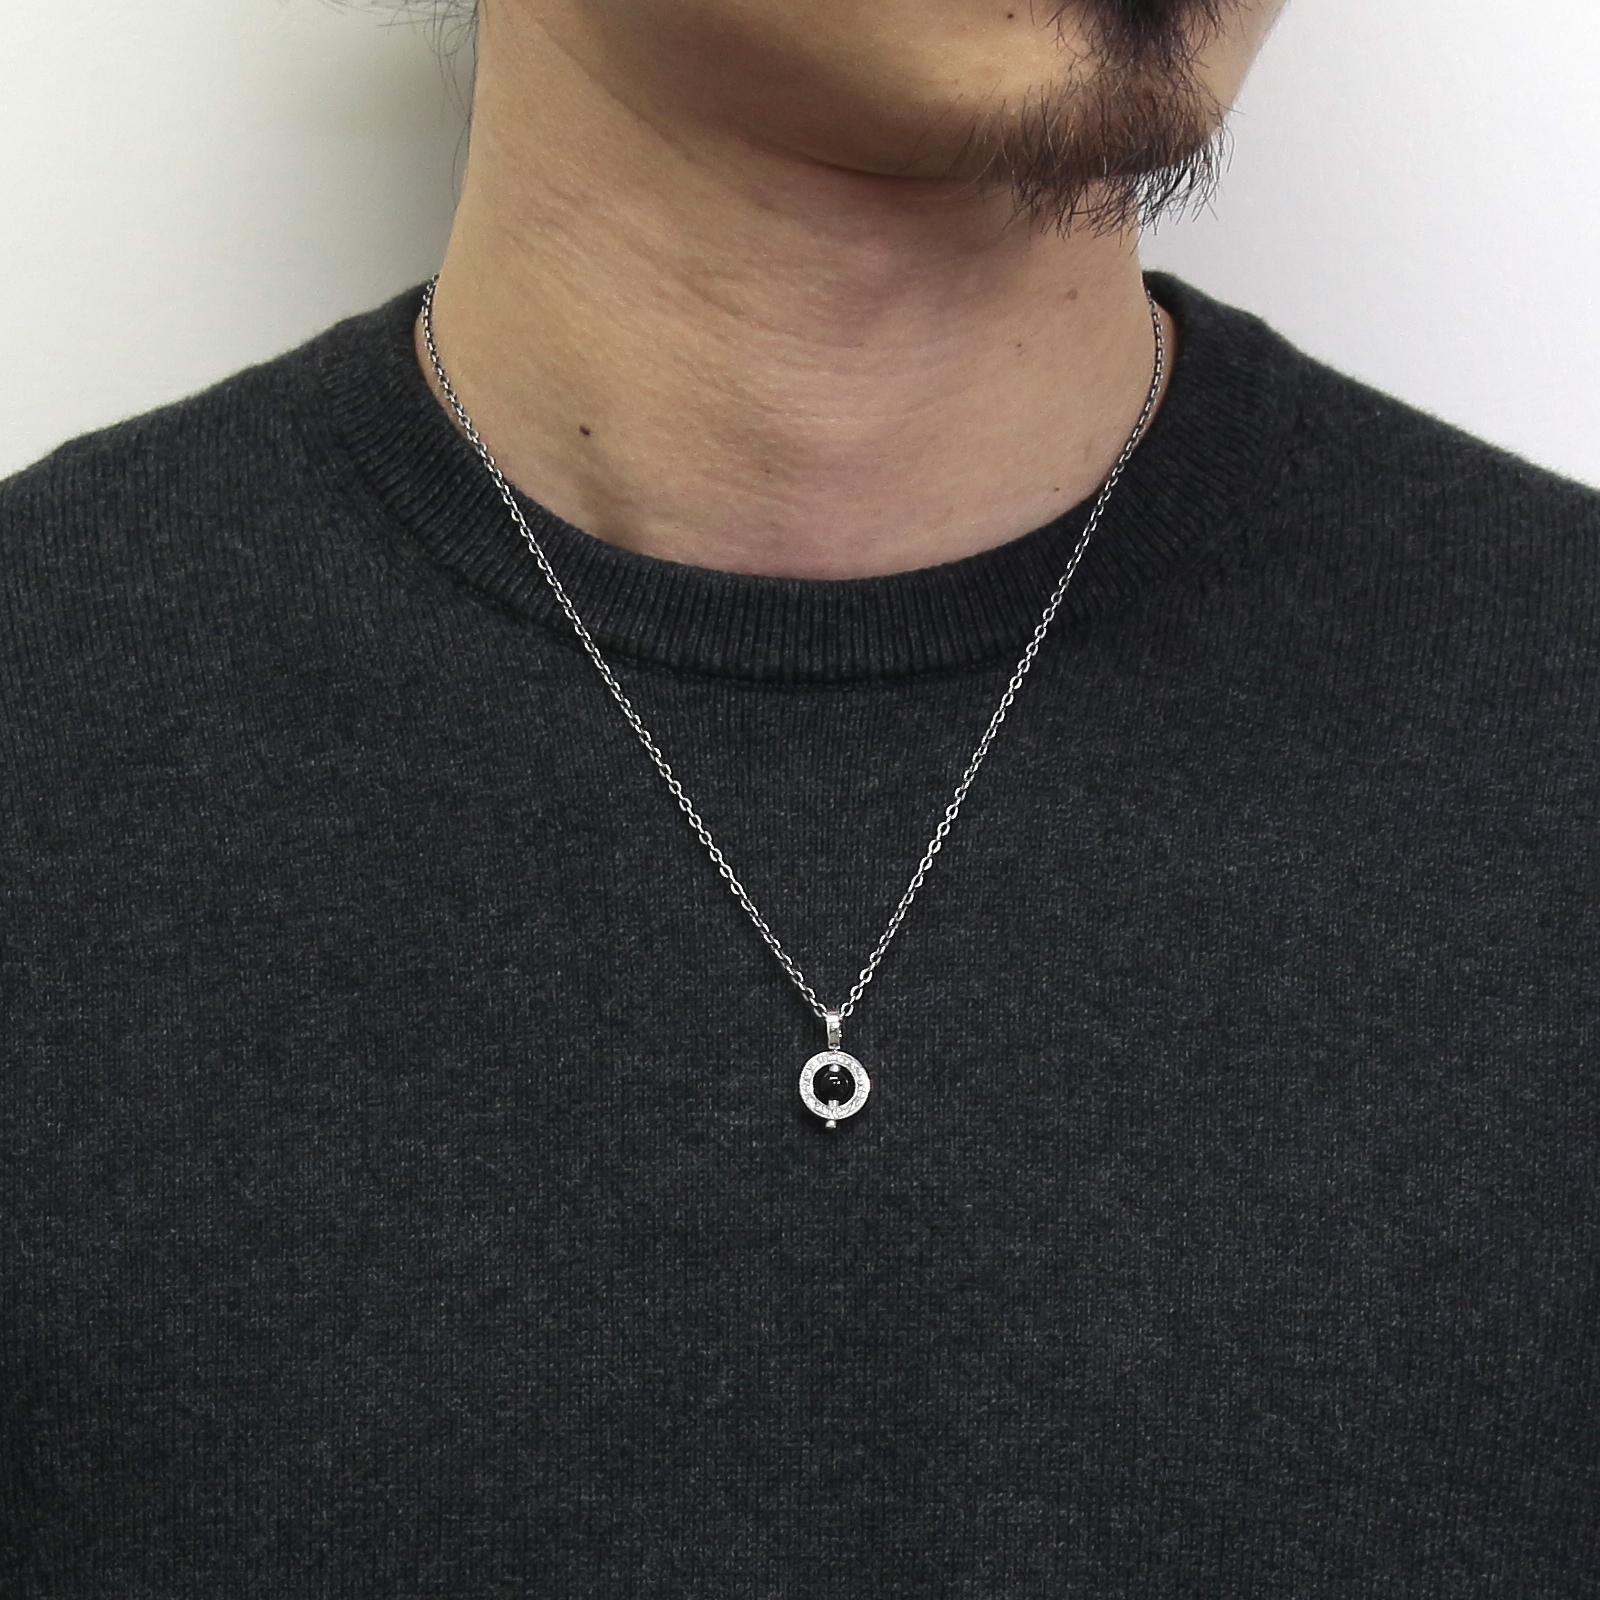 Eternal Carving Bramanda Necklace SV/Onyx